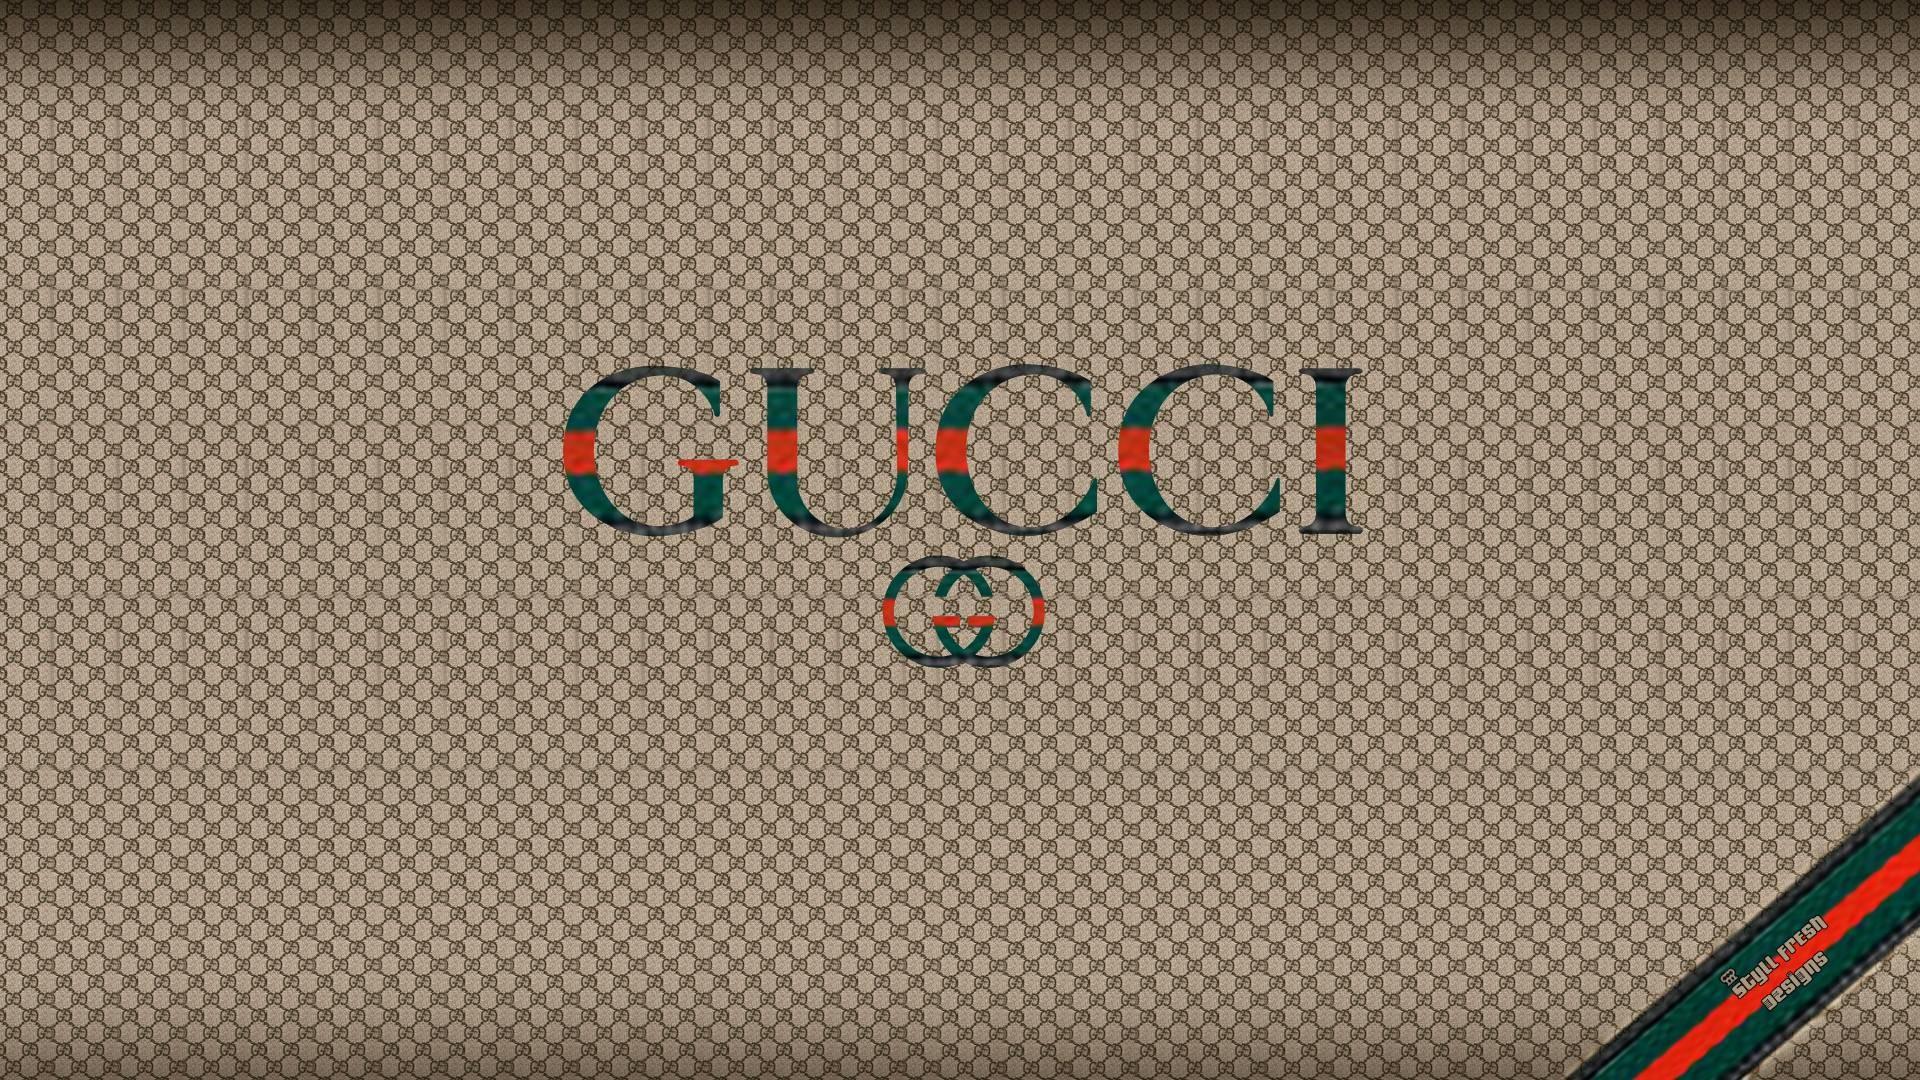 Wallpaper Amazing Cars Gucci Logo Wallpaper 63 Images